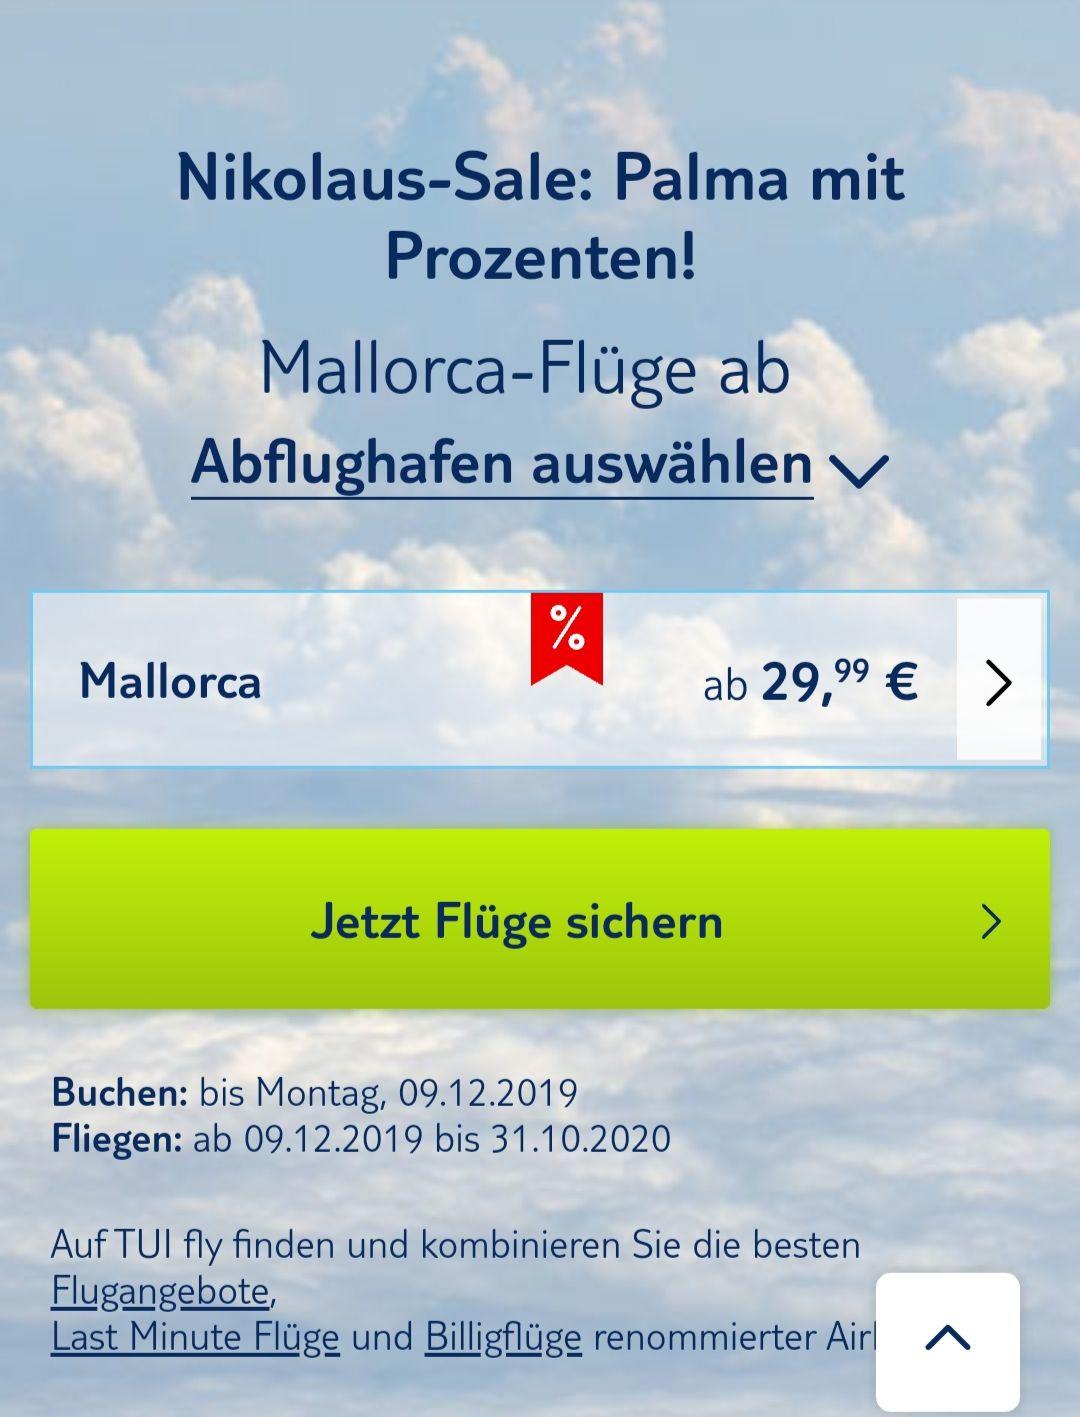 TUIfly mit Nikolaus Sale nach Mallorca